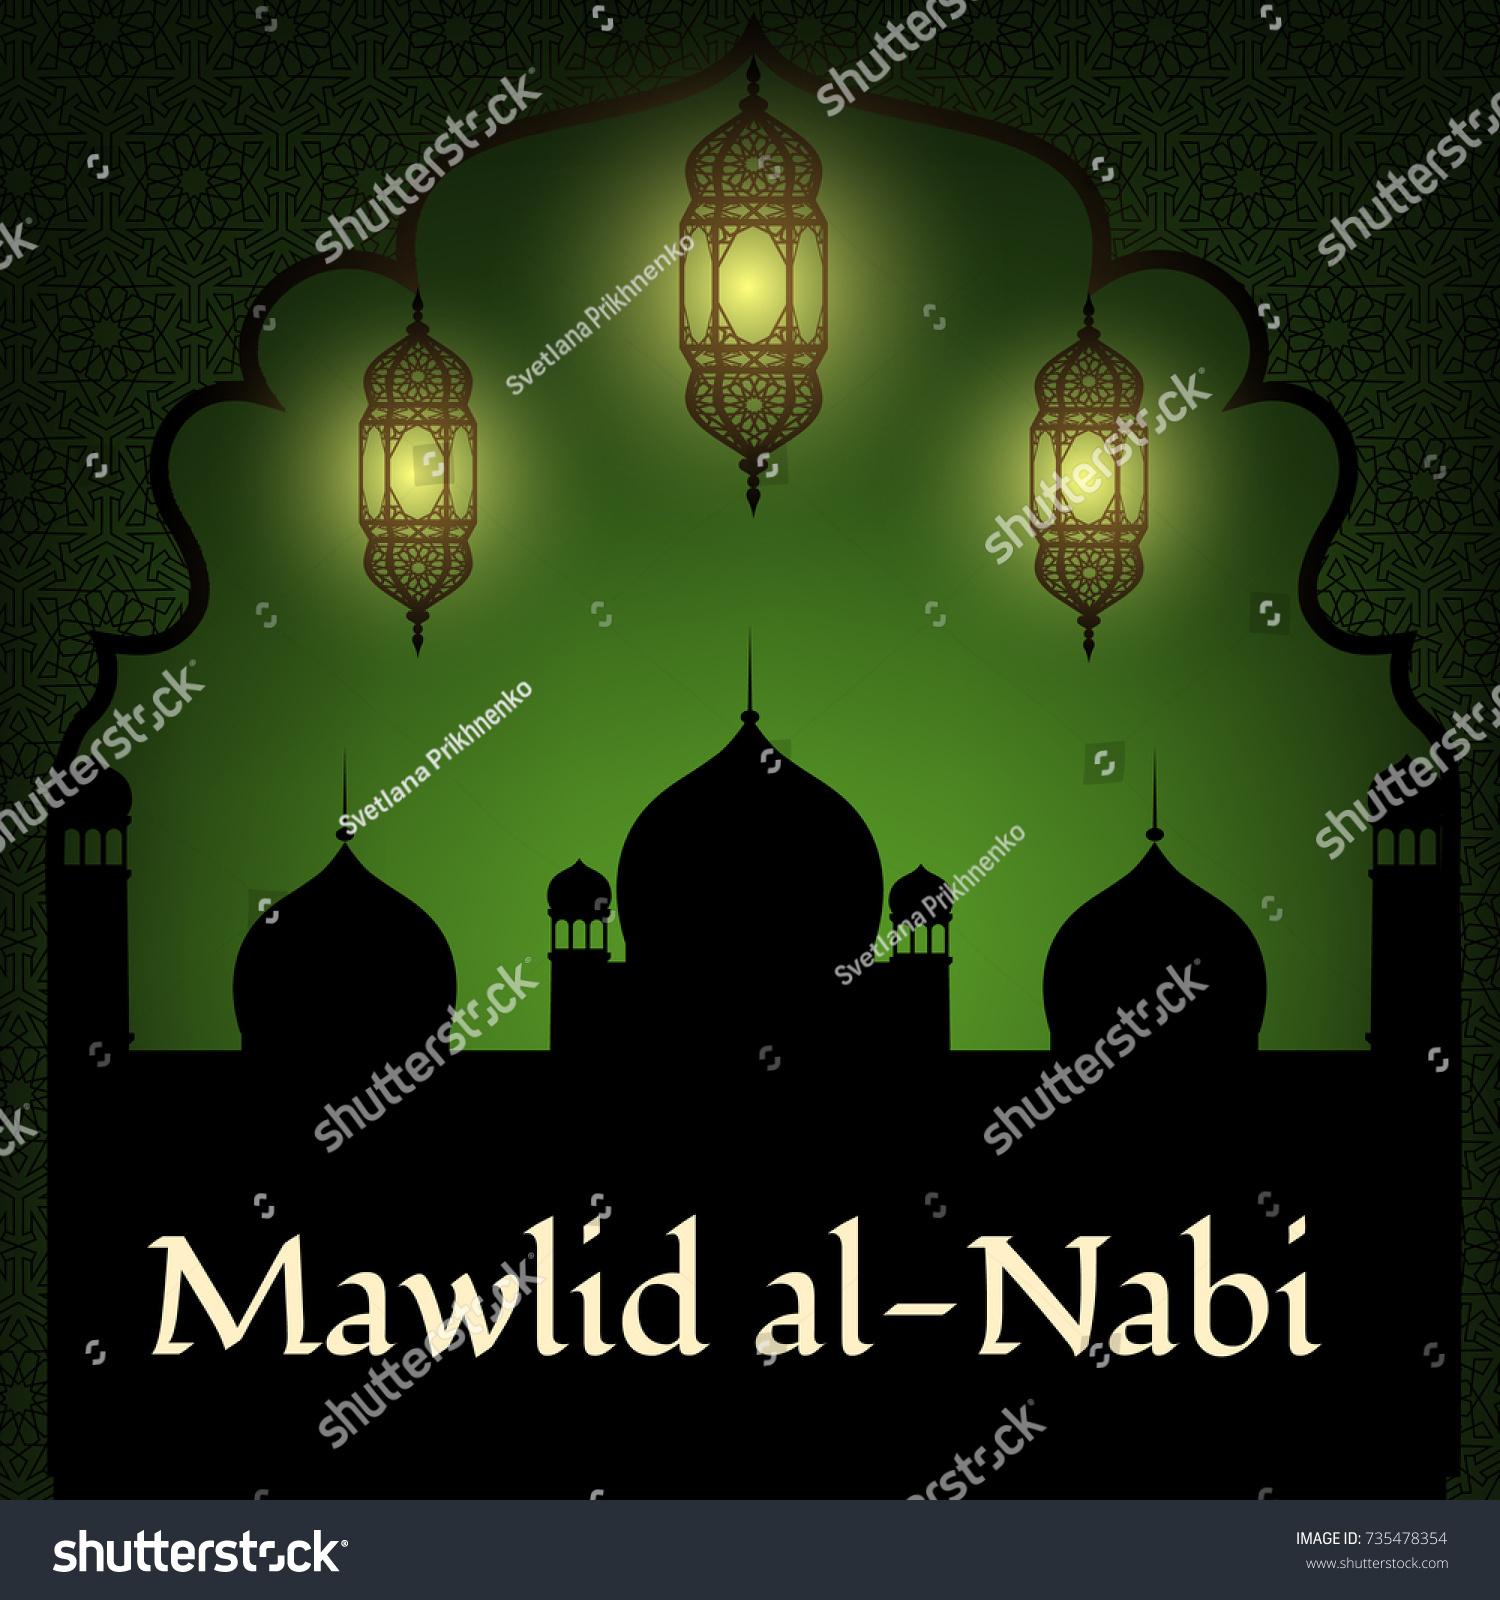 Mawlid al nabi translation prophet muhammads birthday greeting id 735478354 m4hsunfo